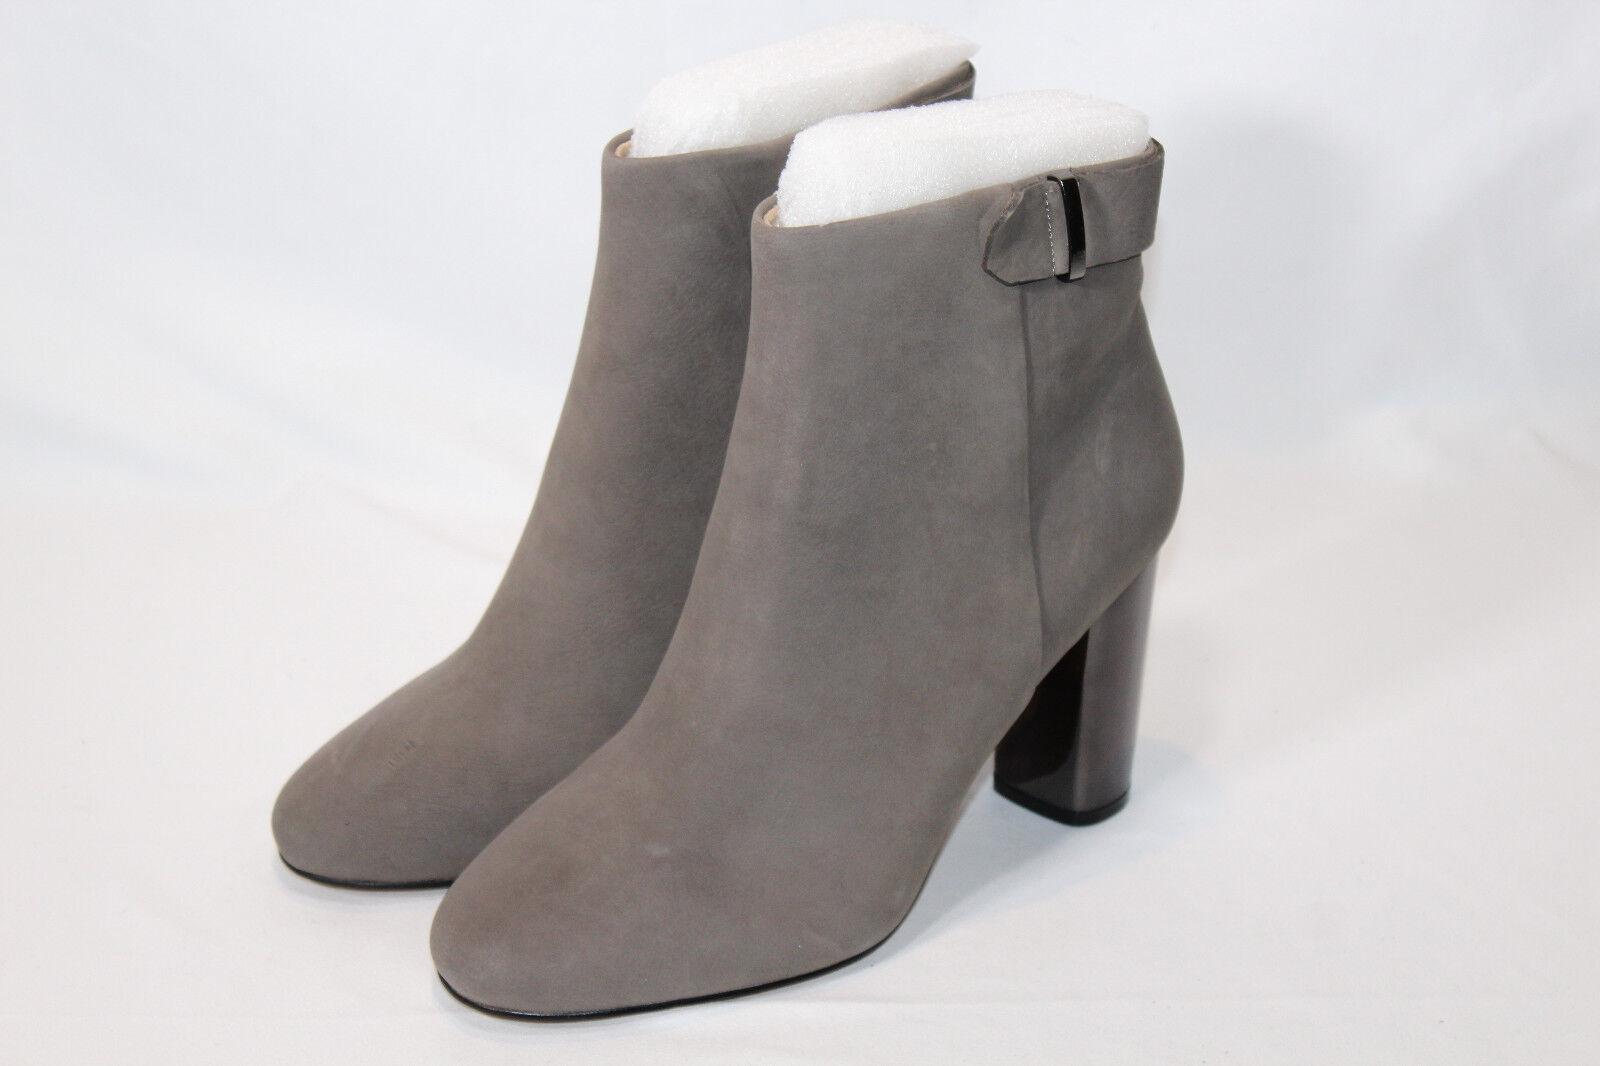 G.I.L.I. Leder Block Heel Ankle Stiefel - Kallie 9.5 MEDIUM STONEUALL NWD